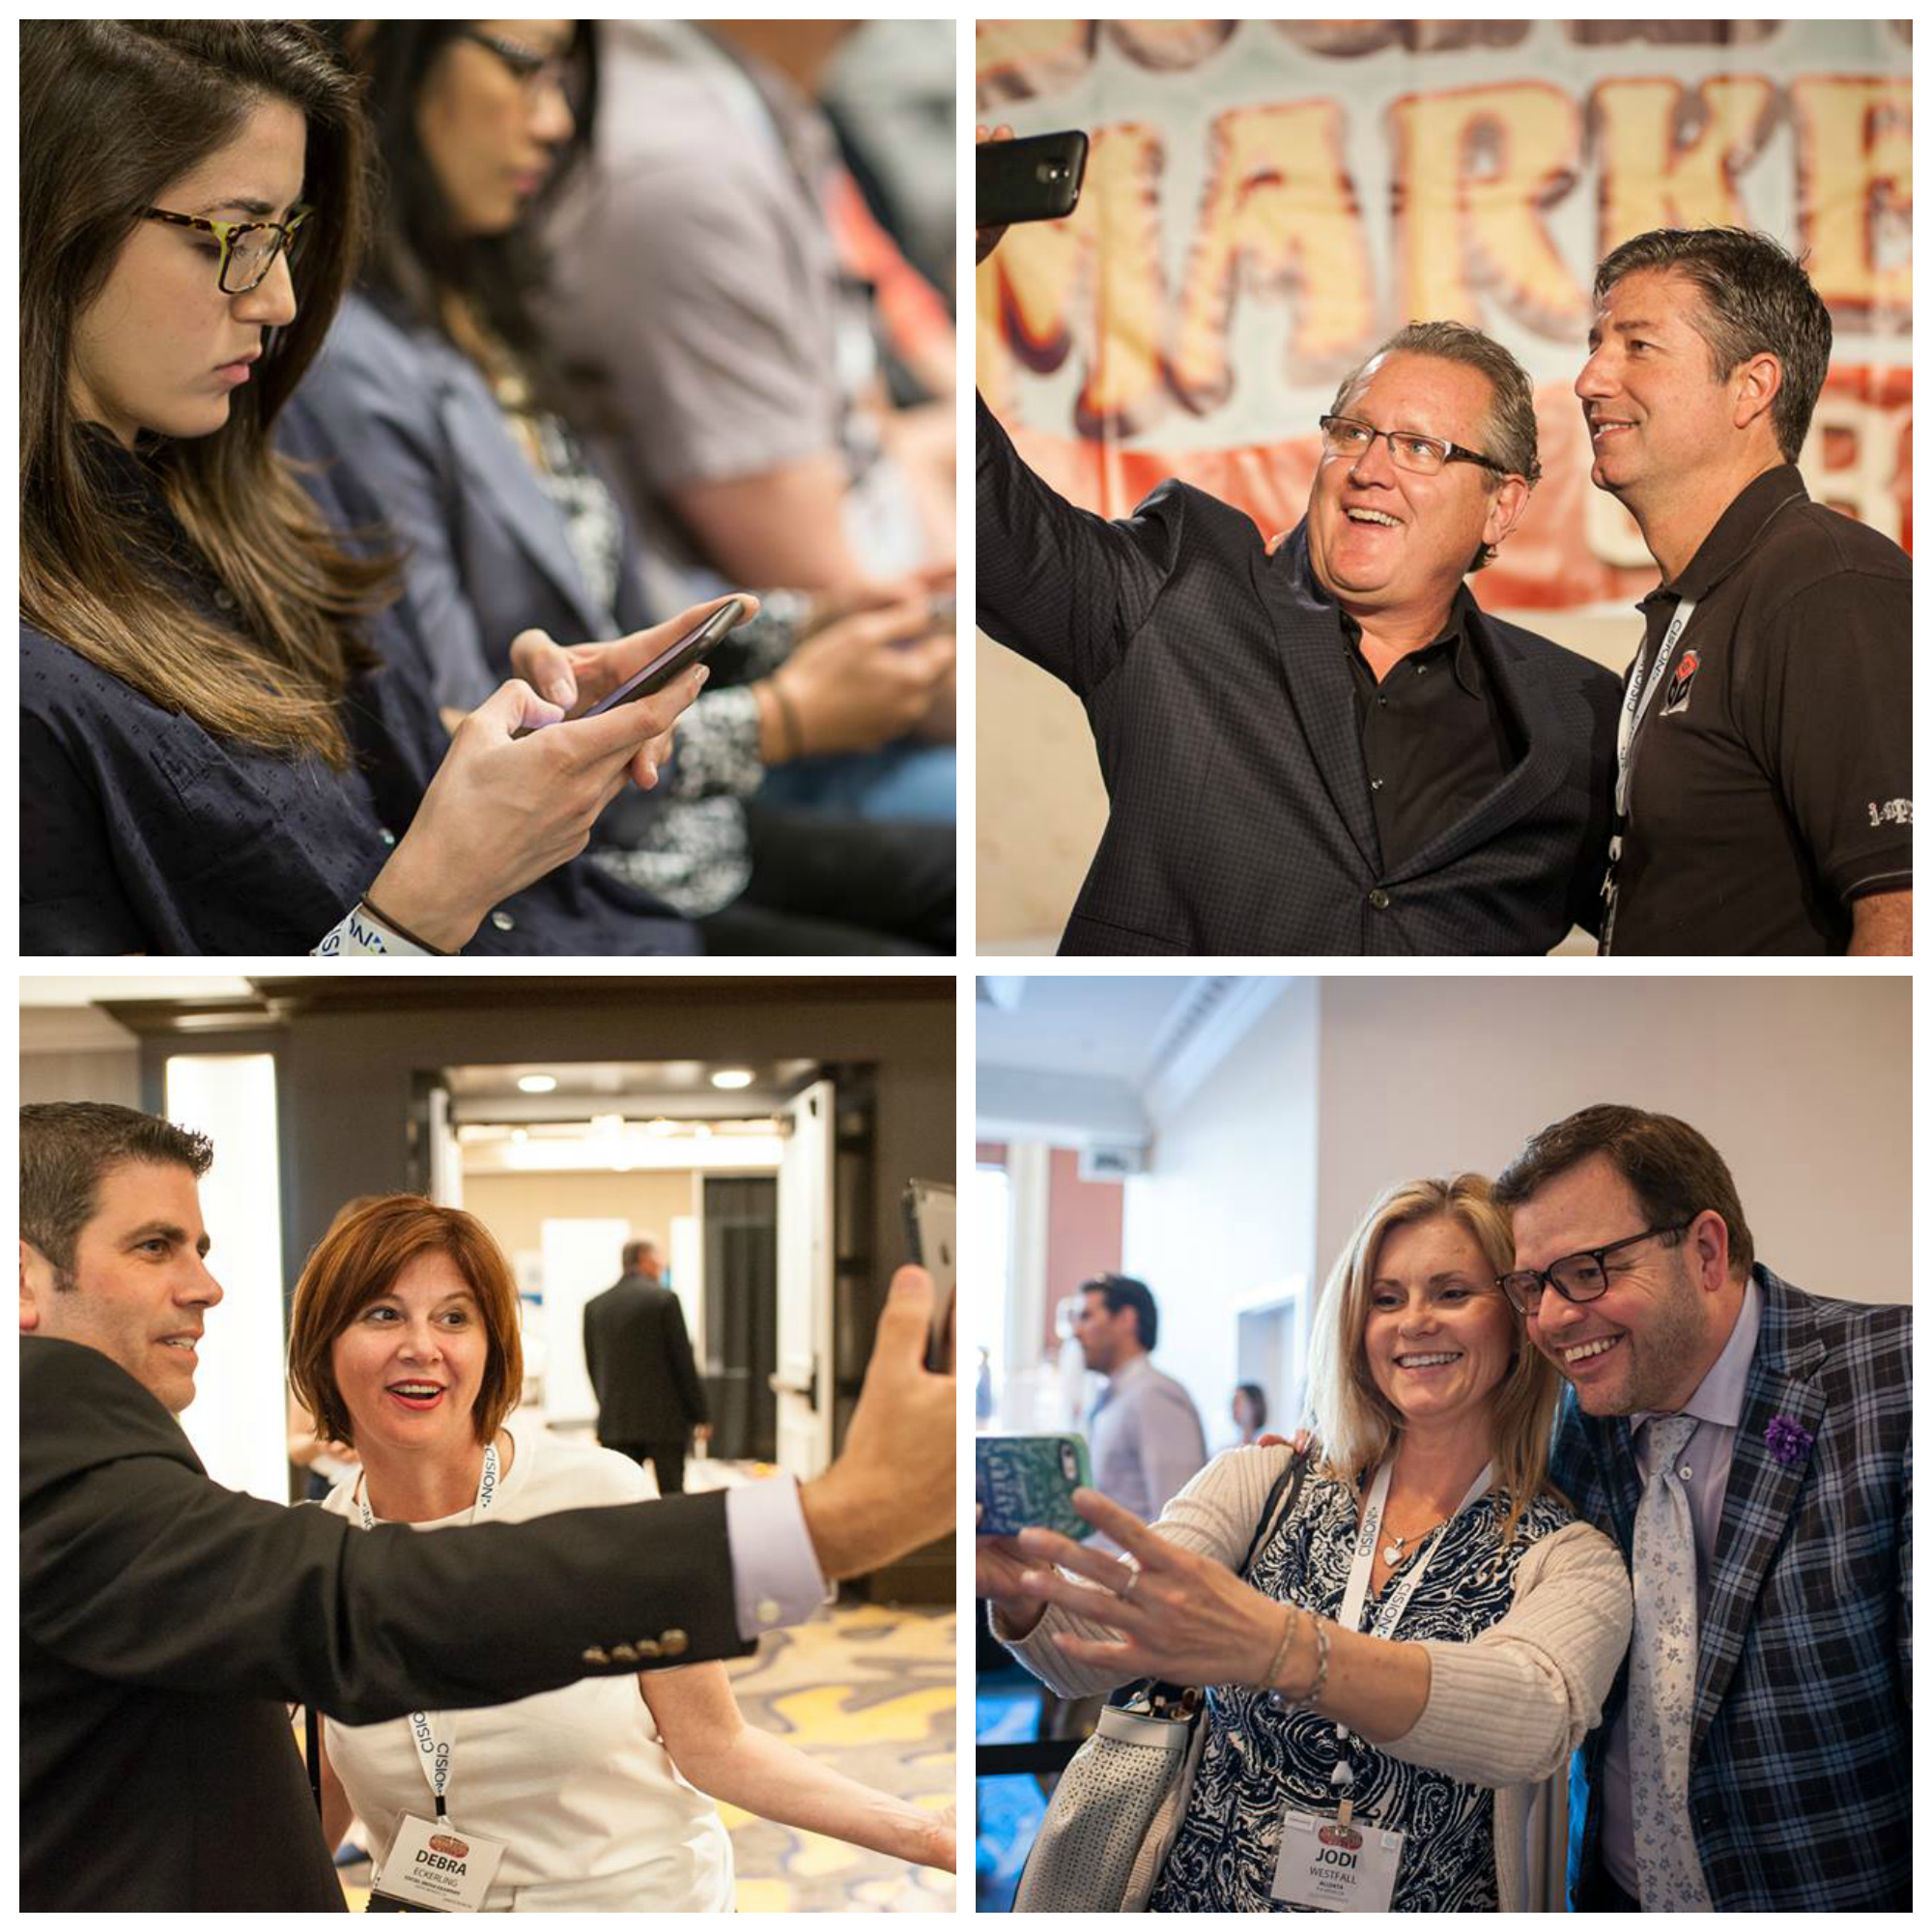 3 days, 2000 people, 1 amazing experience: Social Media Marketing World 2015